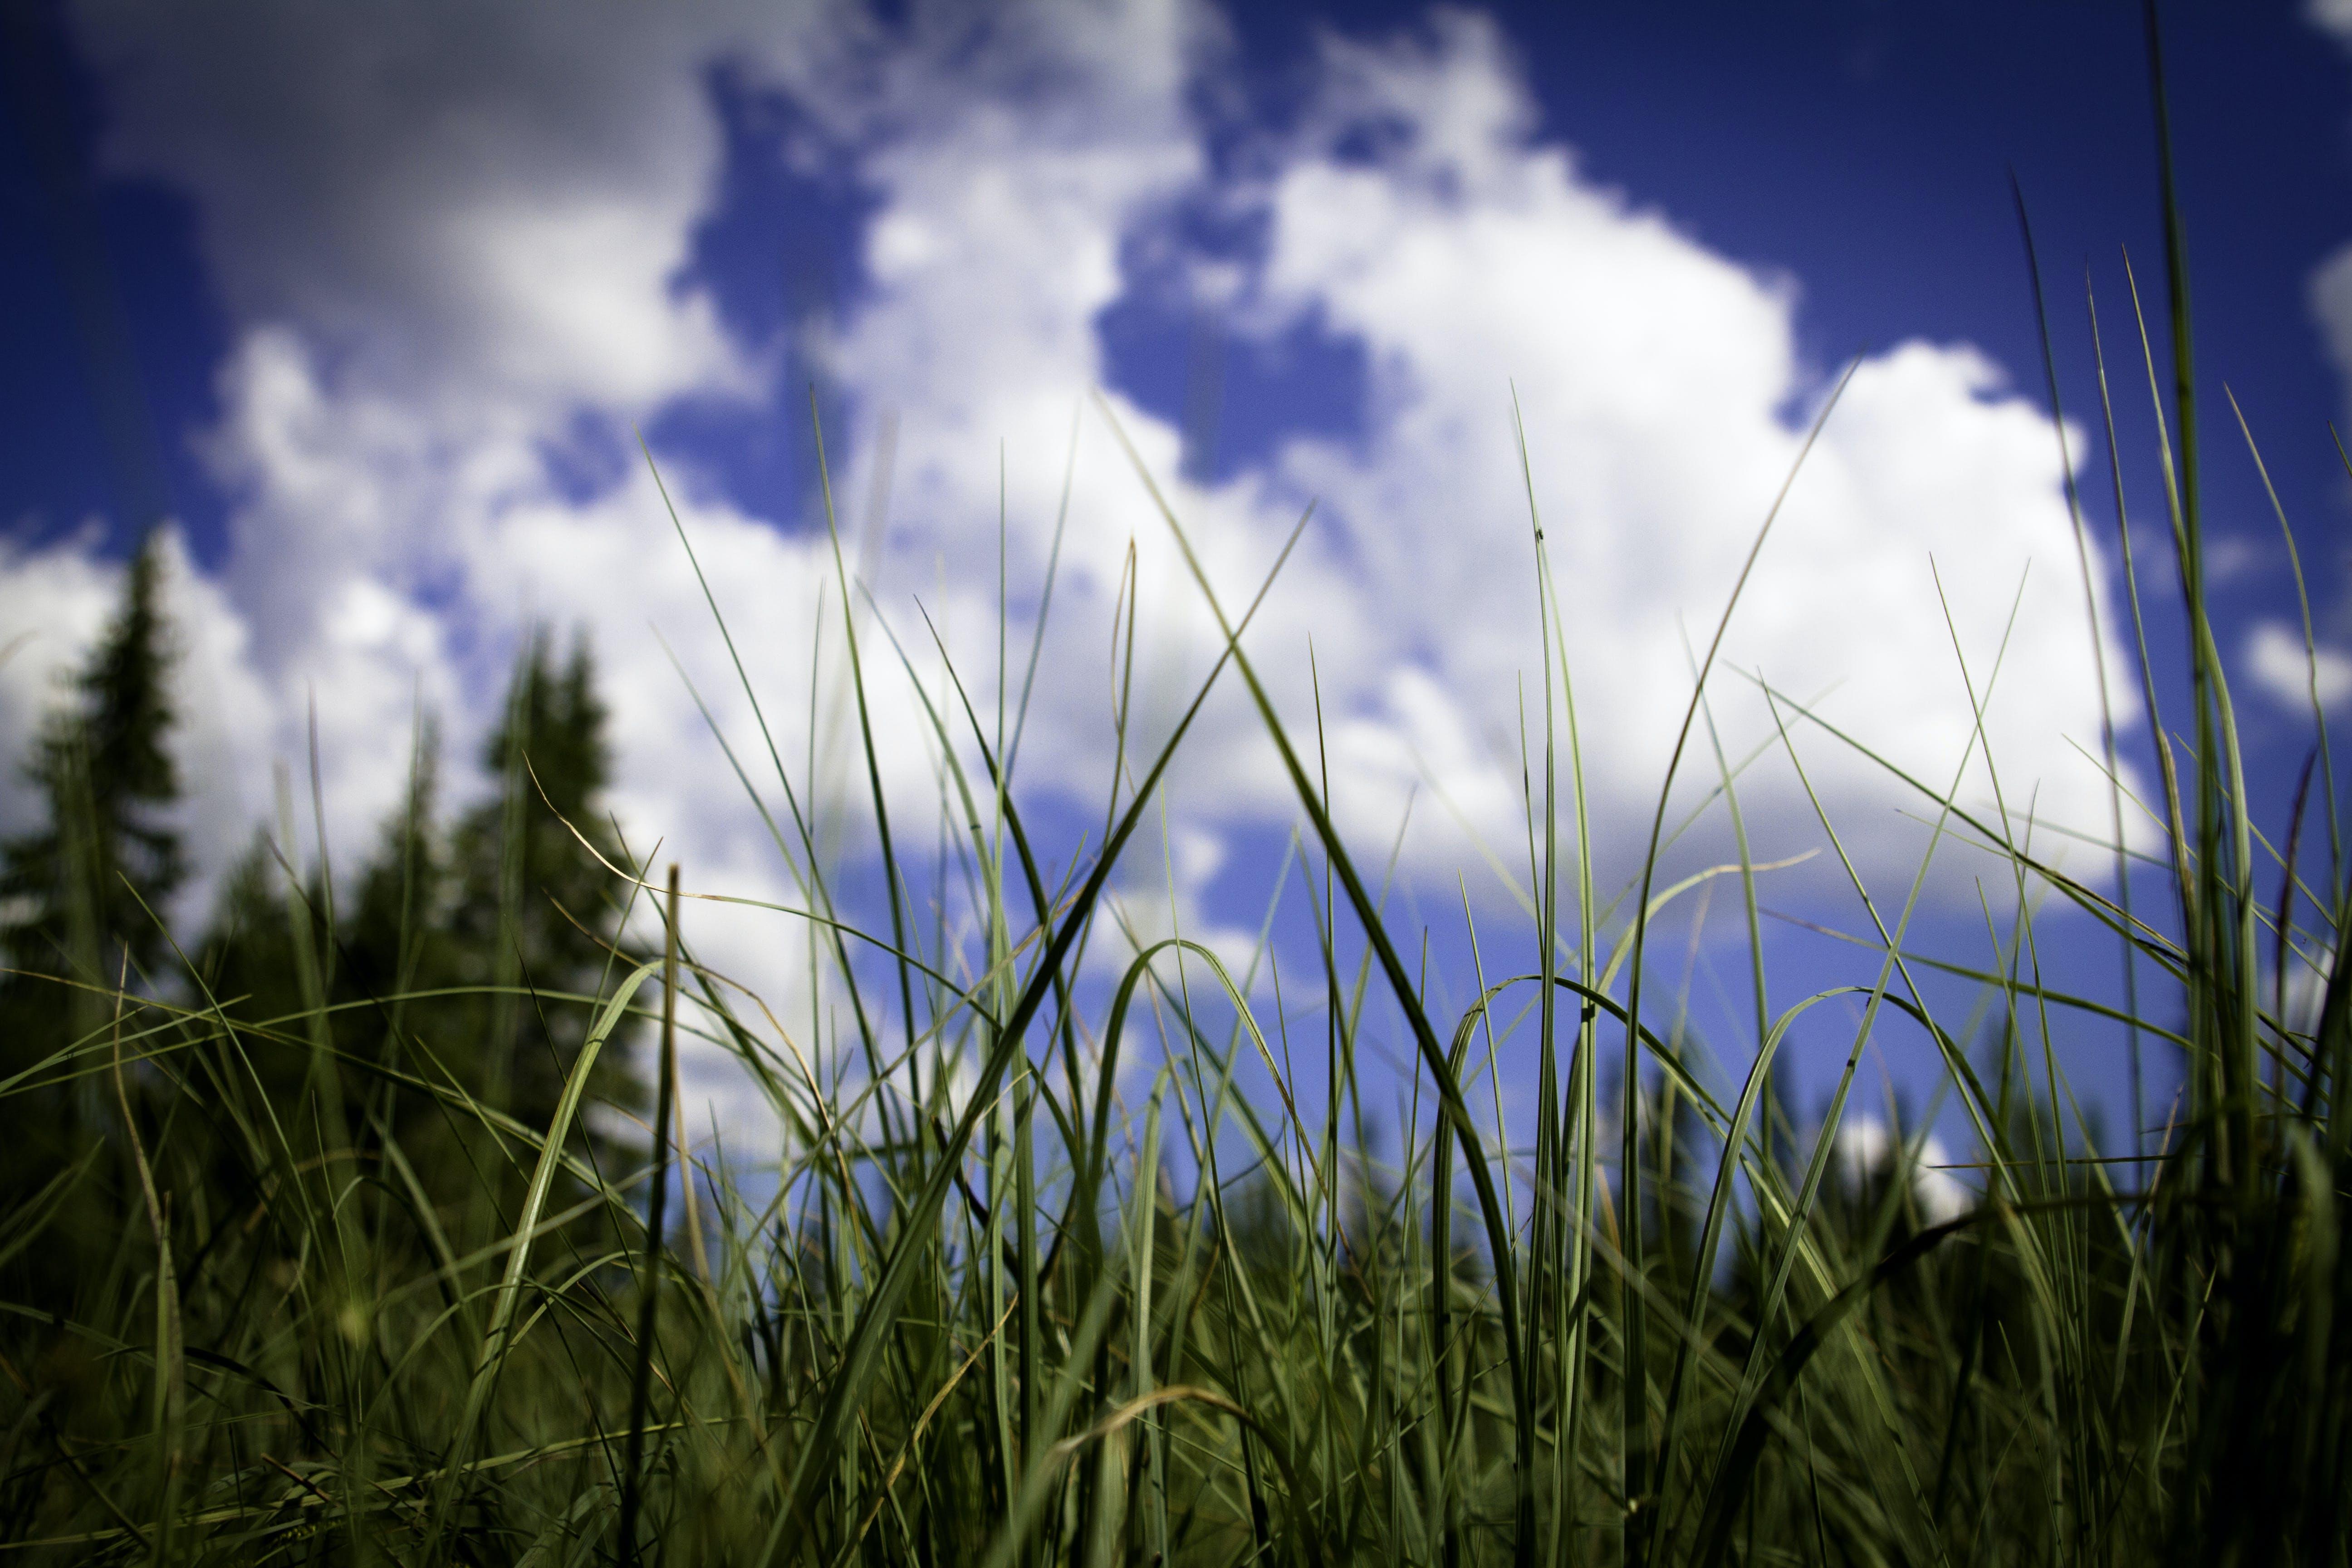 clouds, grass, nature